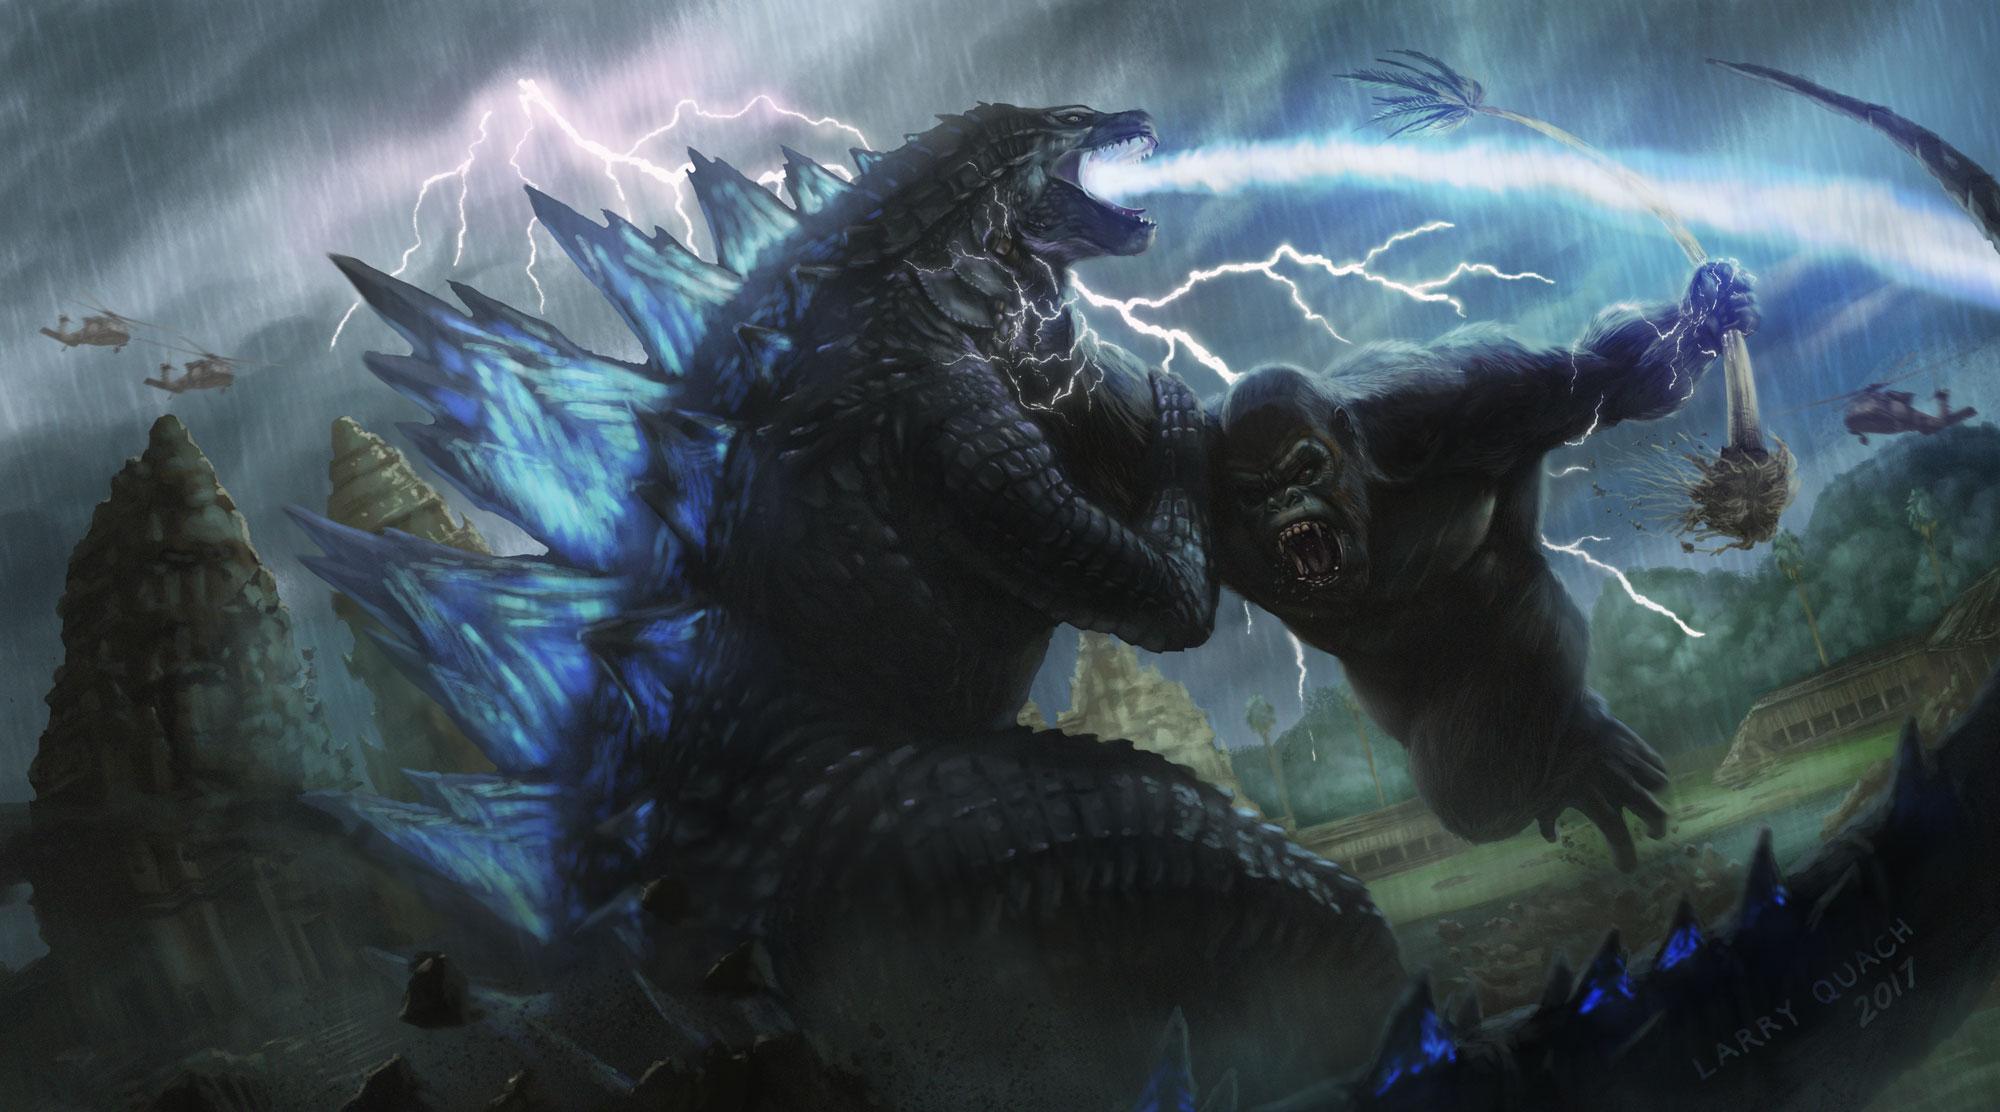 «Годзиллу против Конга» могут перенести